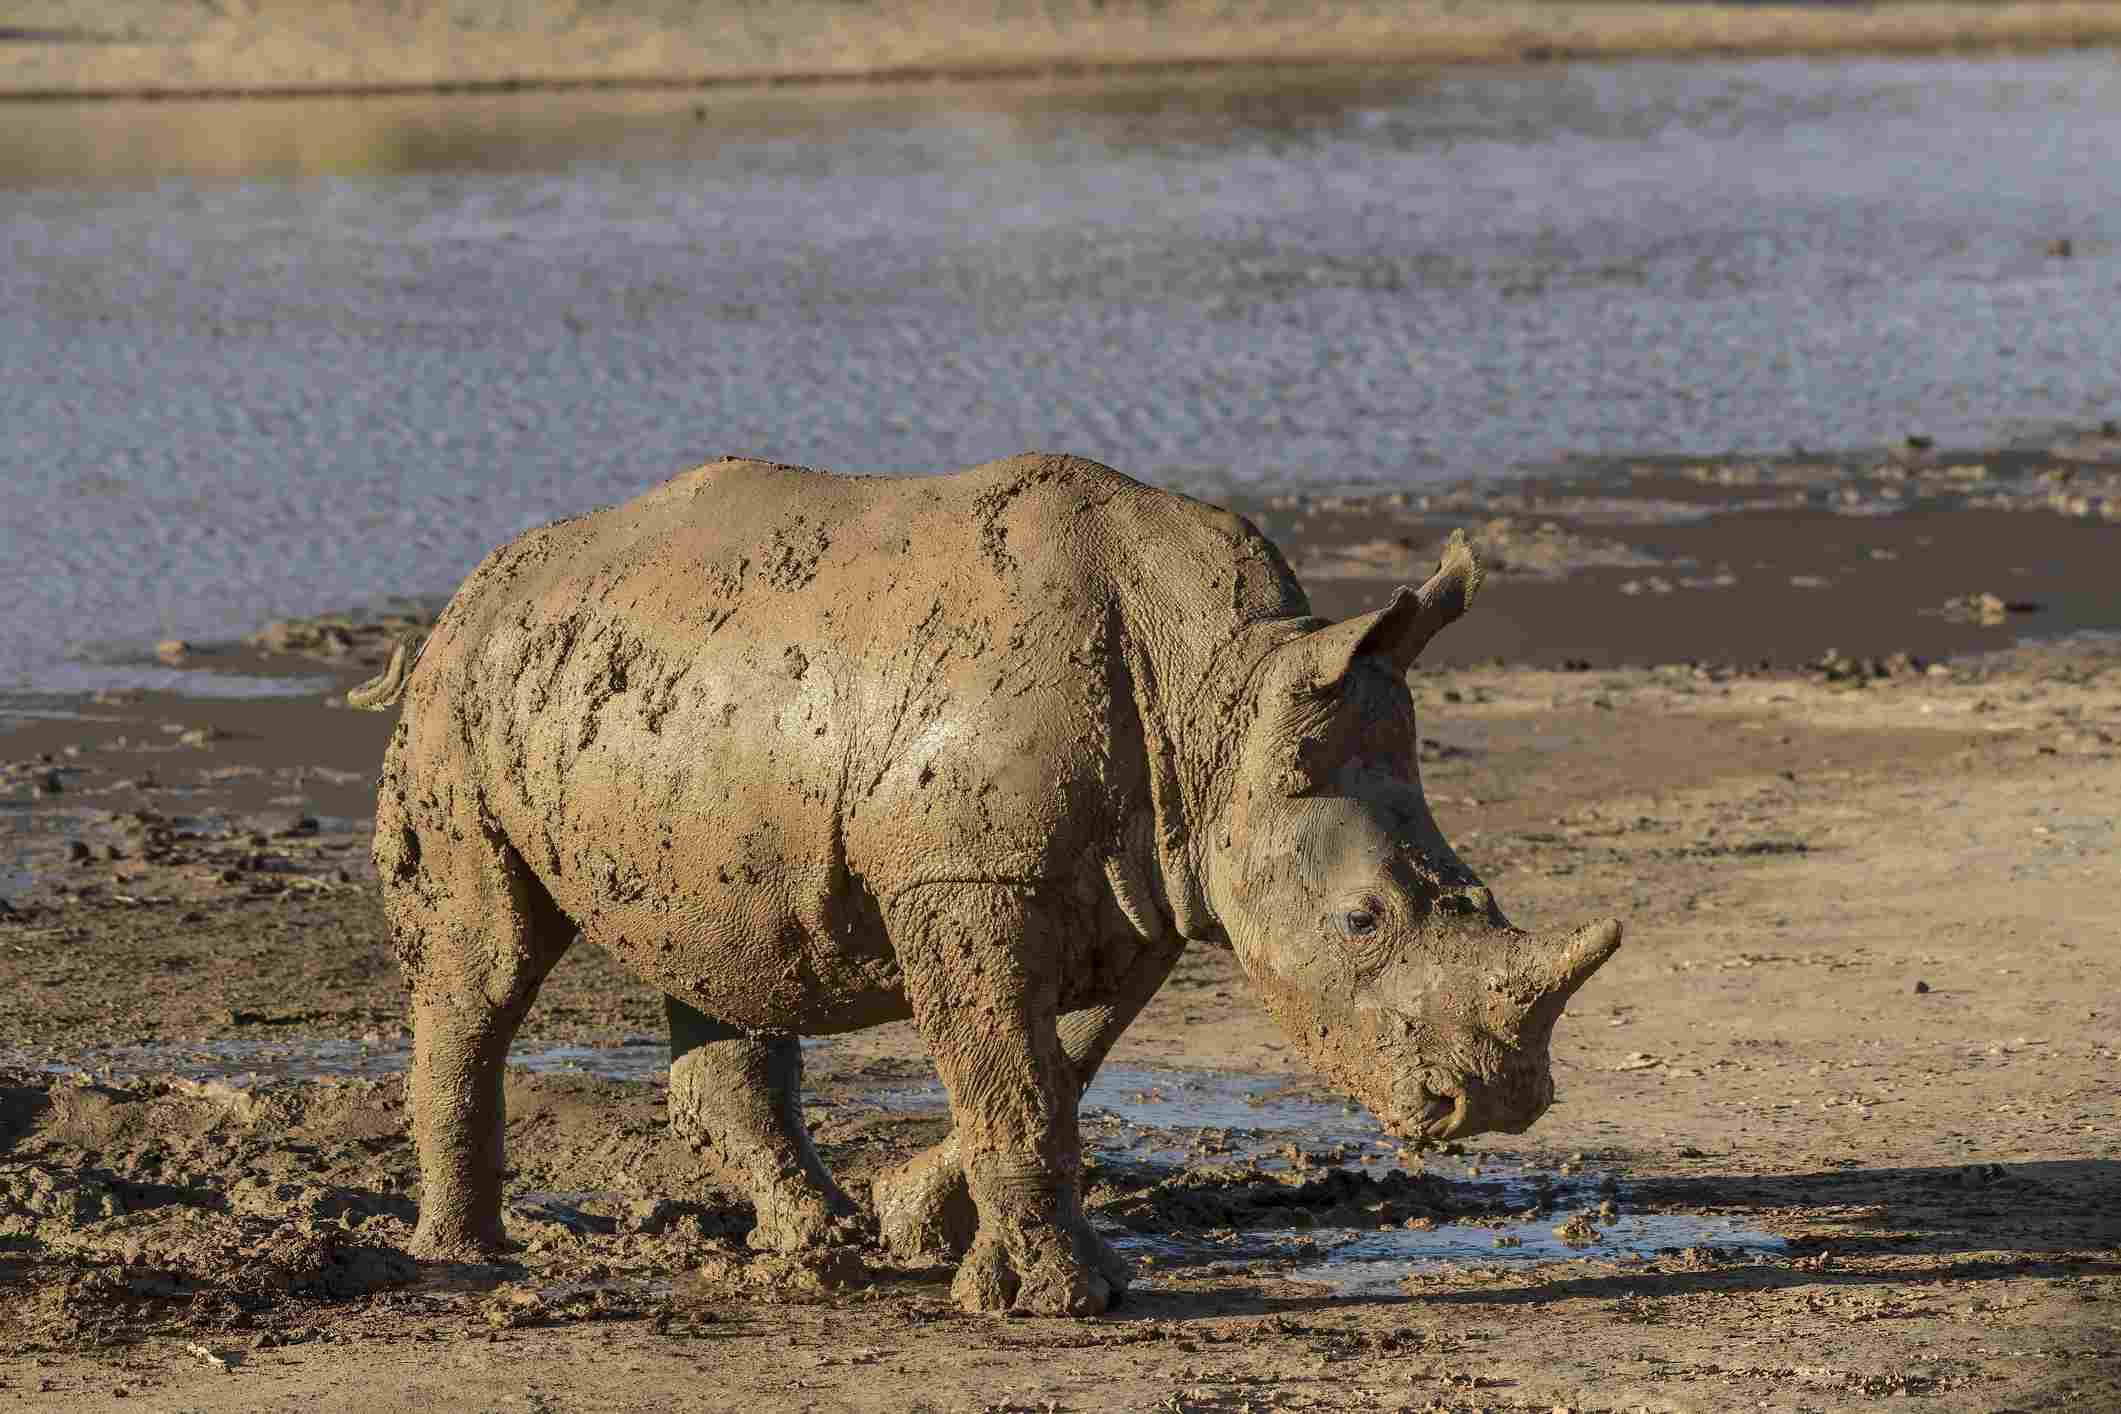 Aquila Private Game Reserve, Western Cape, South Africa